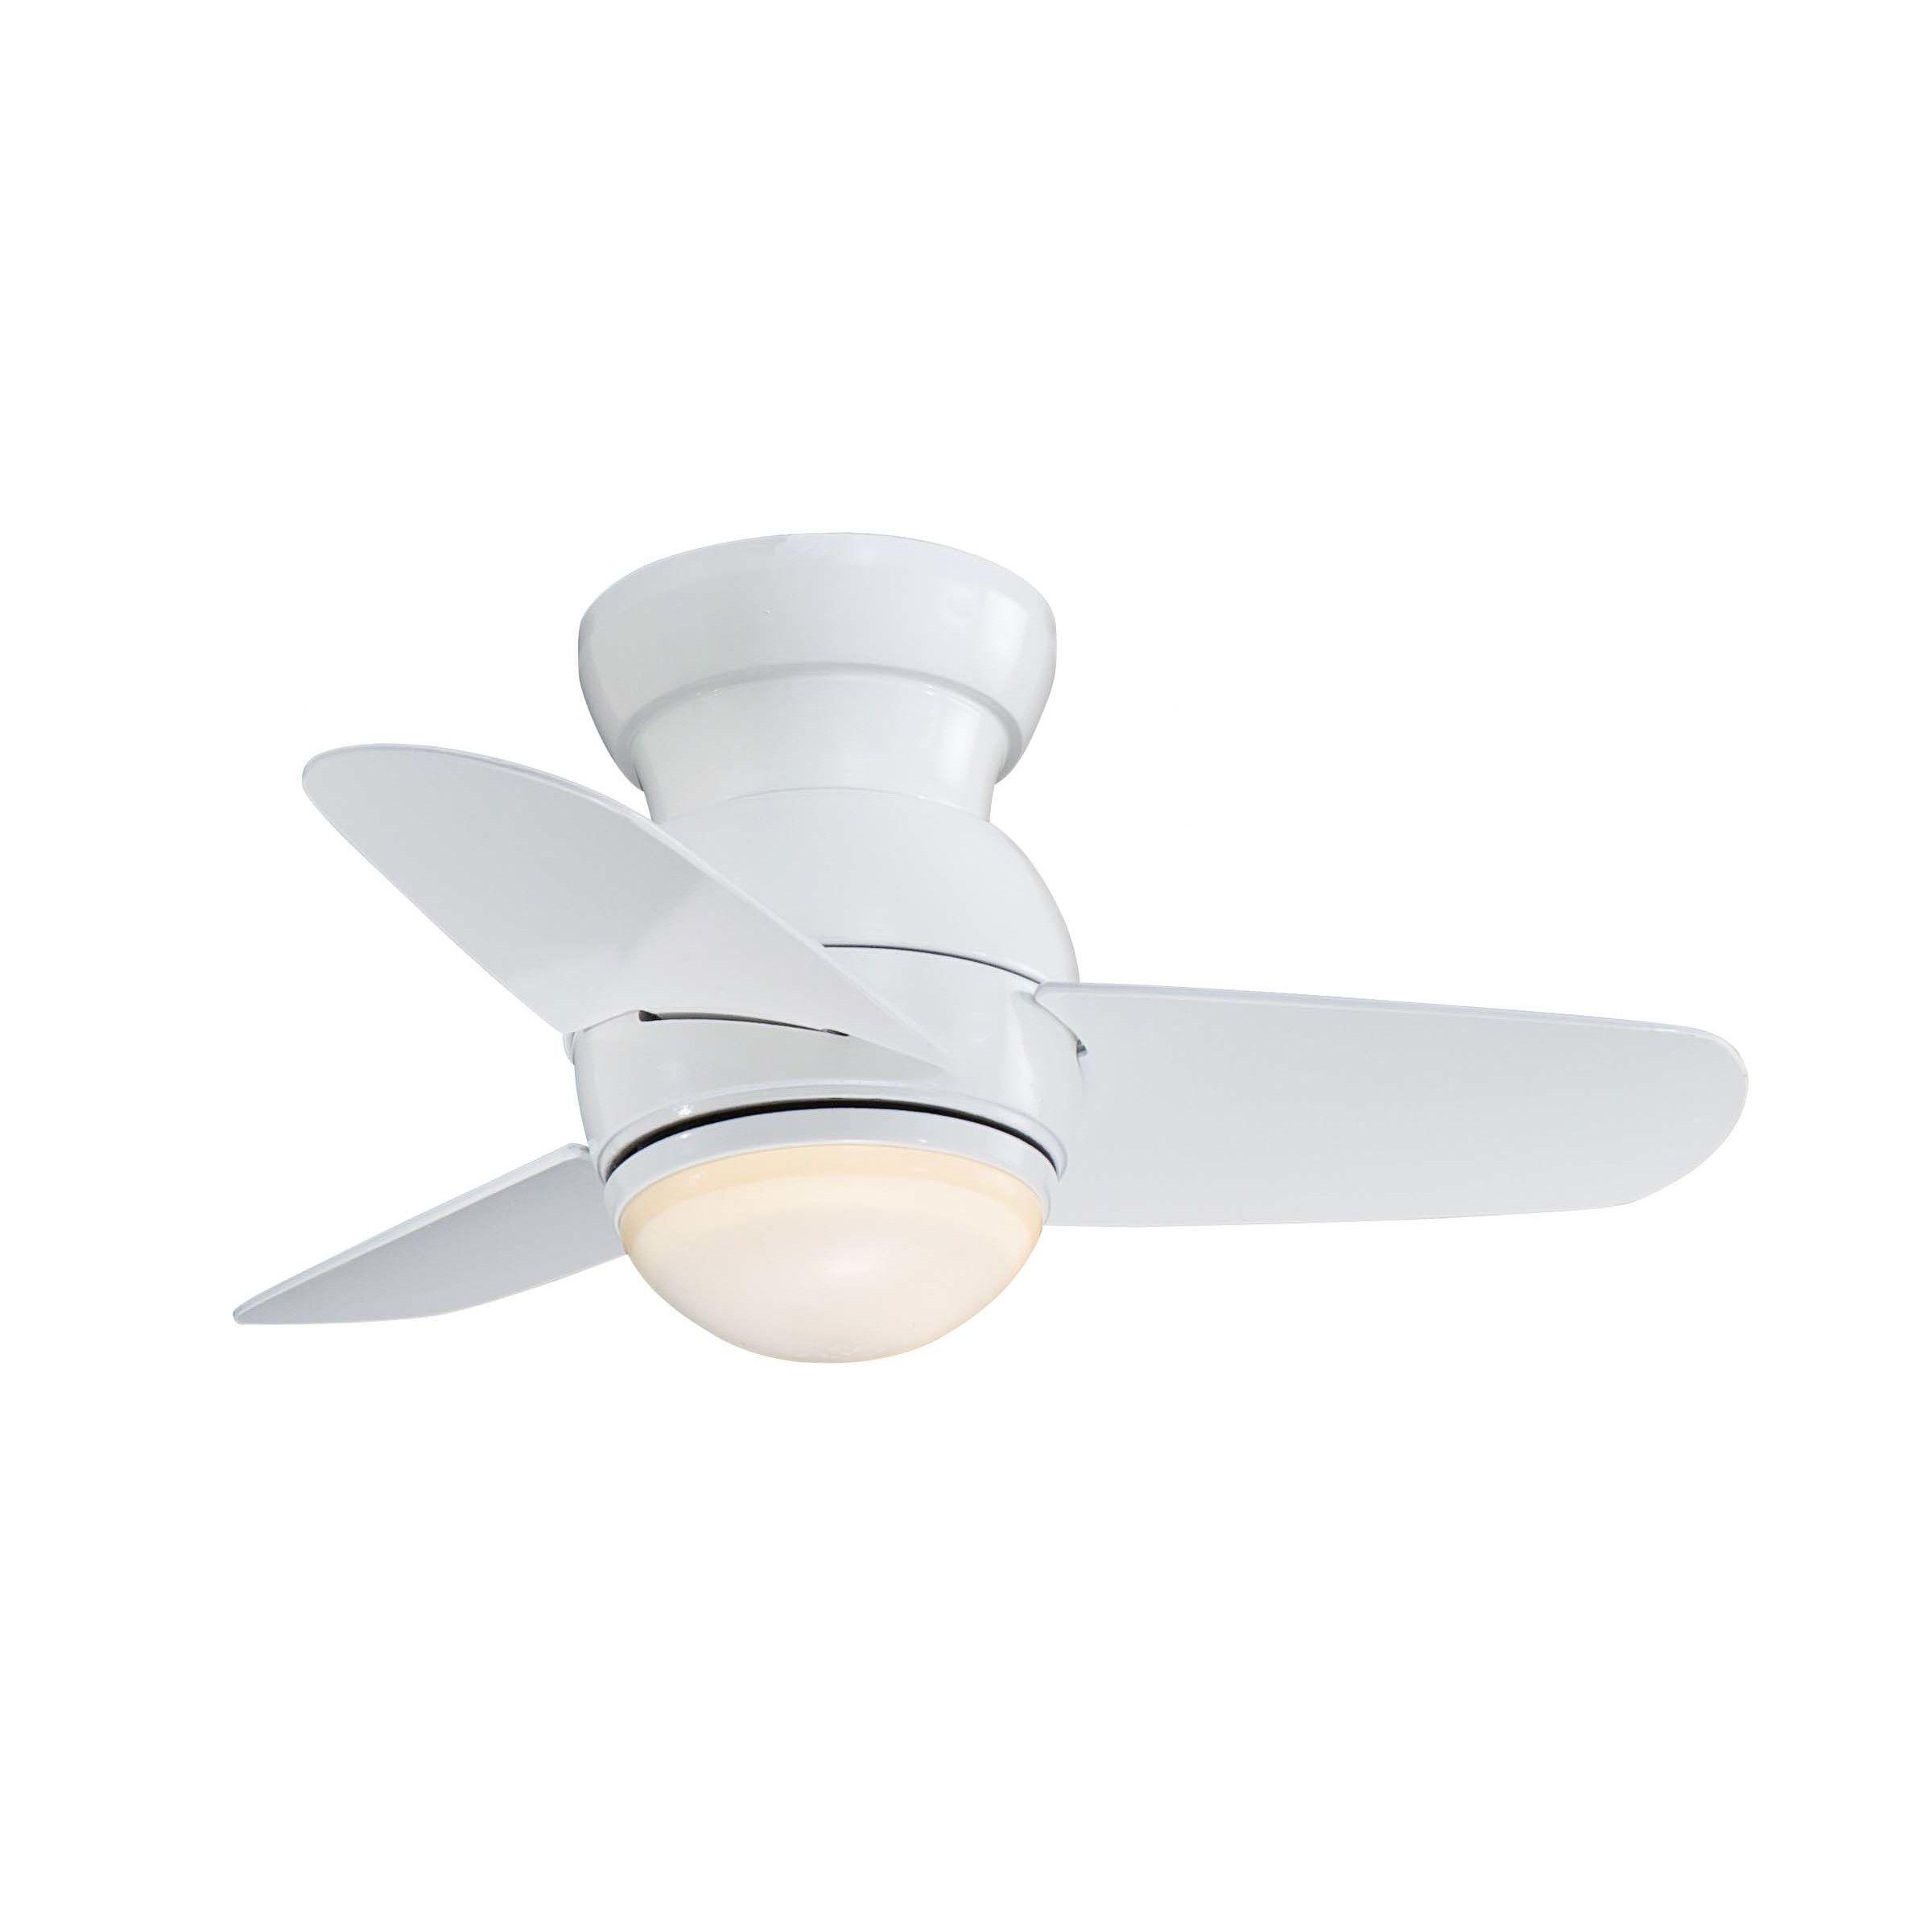 Minka Aire 26 Spacesaver Flush Mount 3 Blade Ceiling Fan Reviews Wayfair Ceiling Fan Modern Ceiling Fan Hugger Ceiling Fan Minka aire ceiling fans reviews